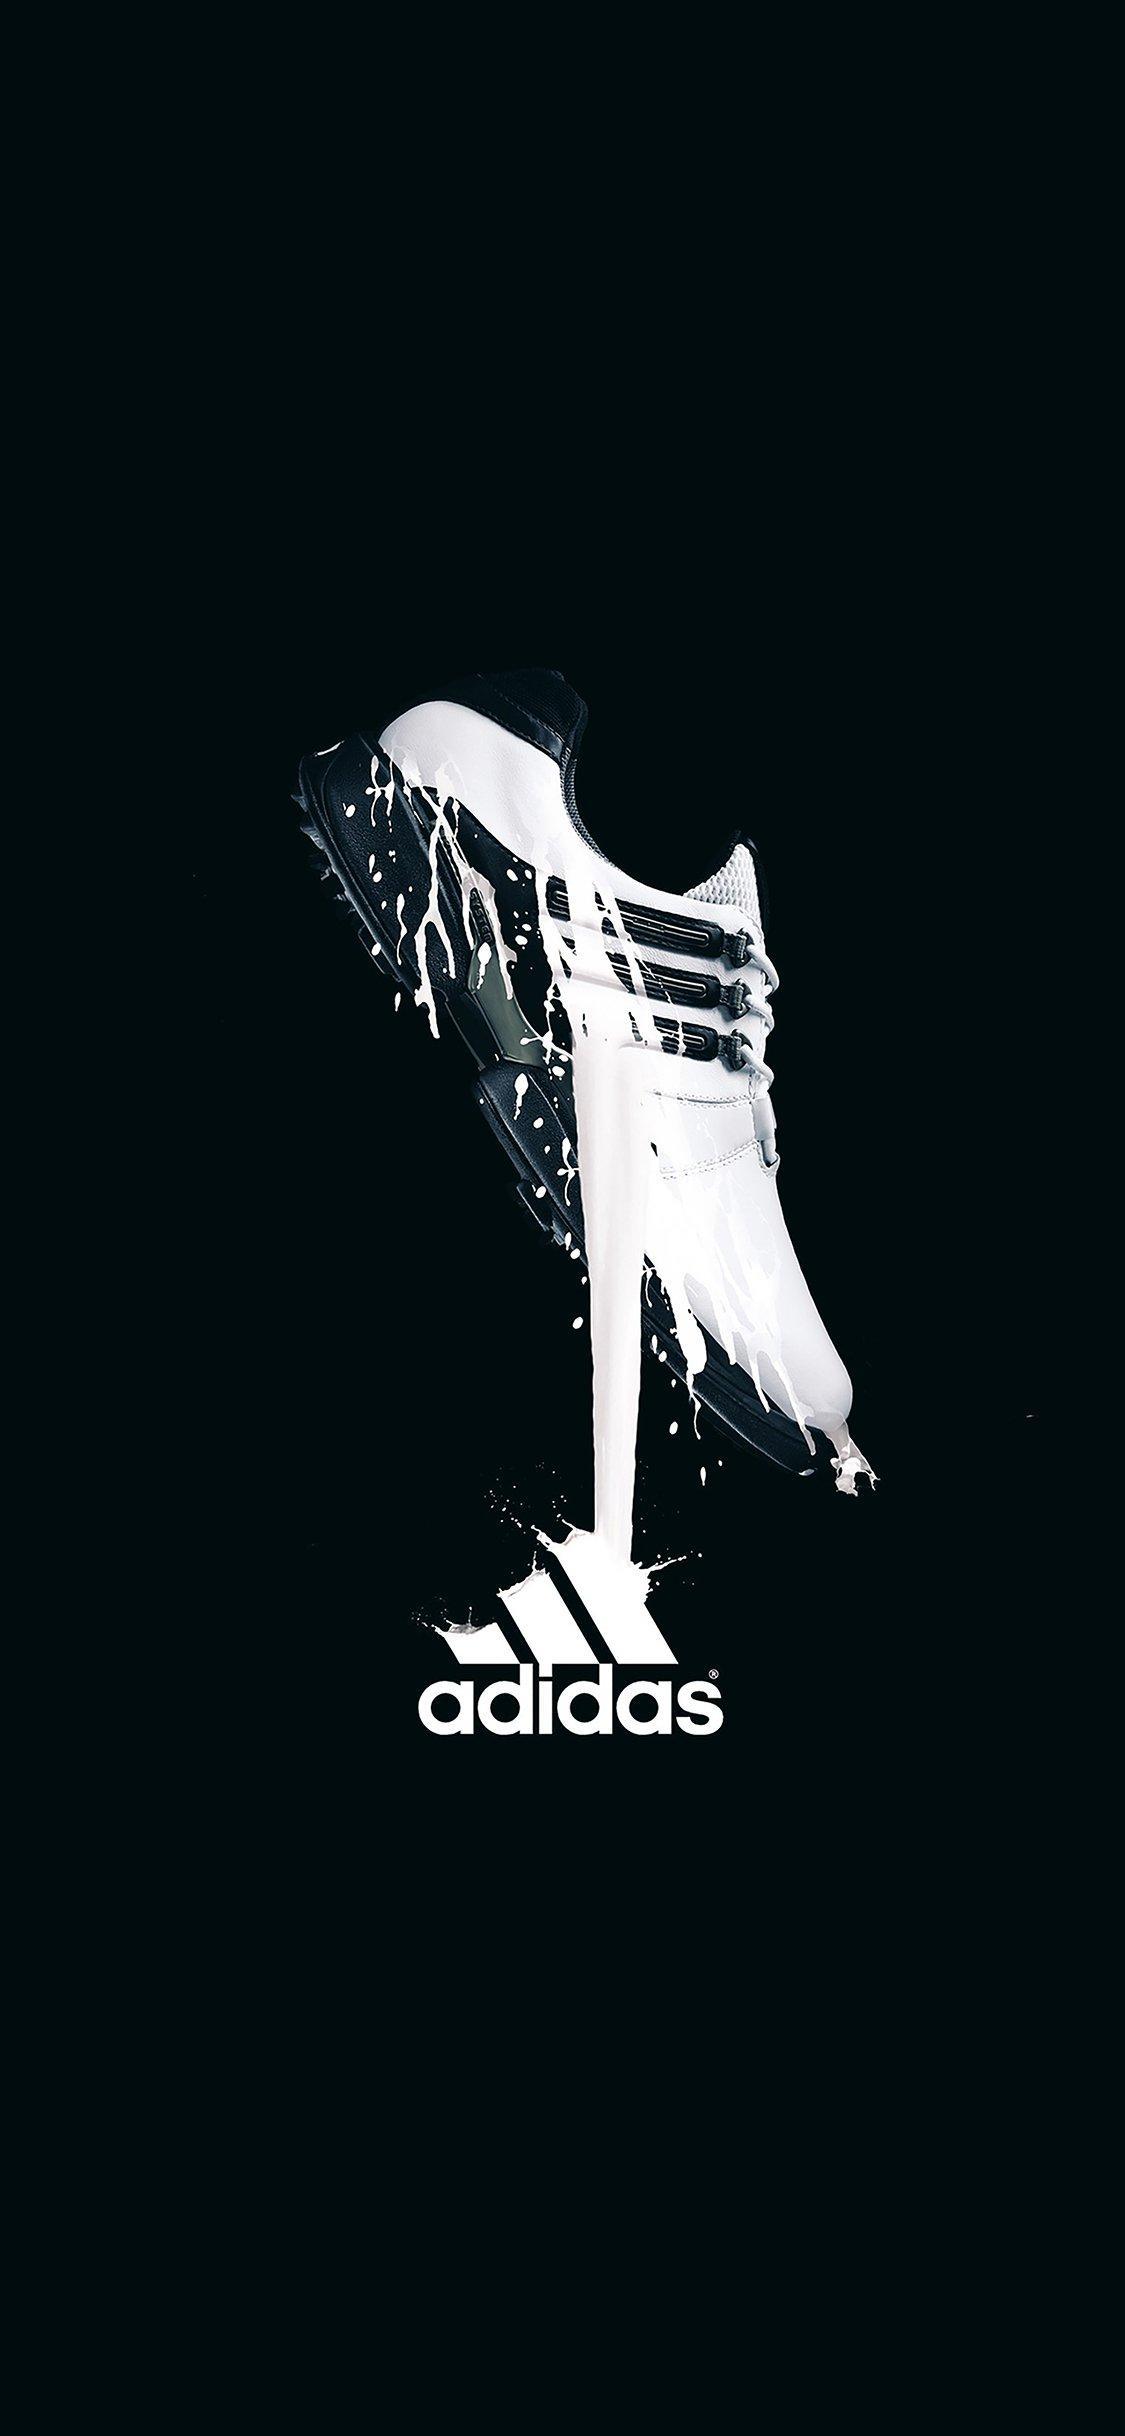 ultra hd adidas wallpaper iphone x